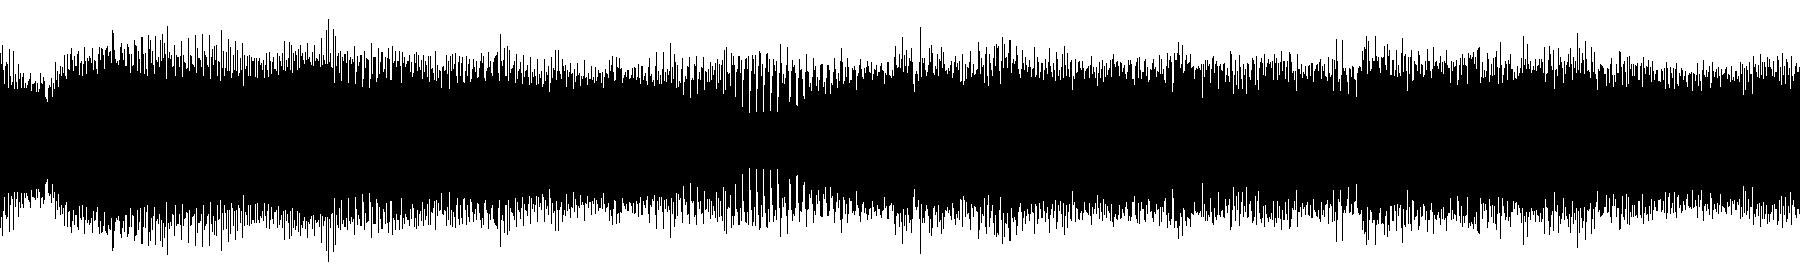 veh2 special sounds   33